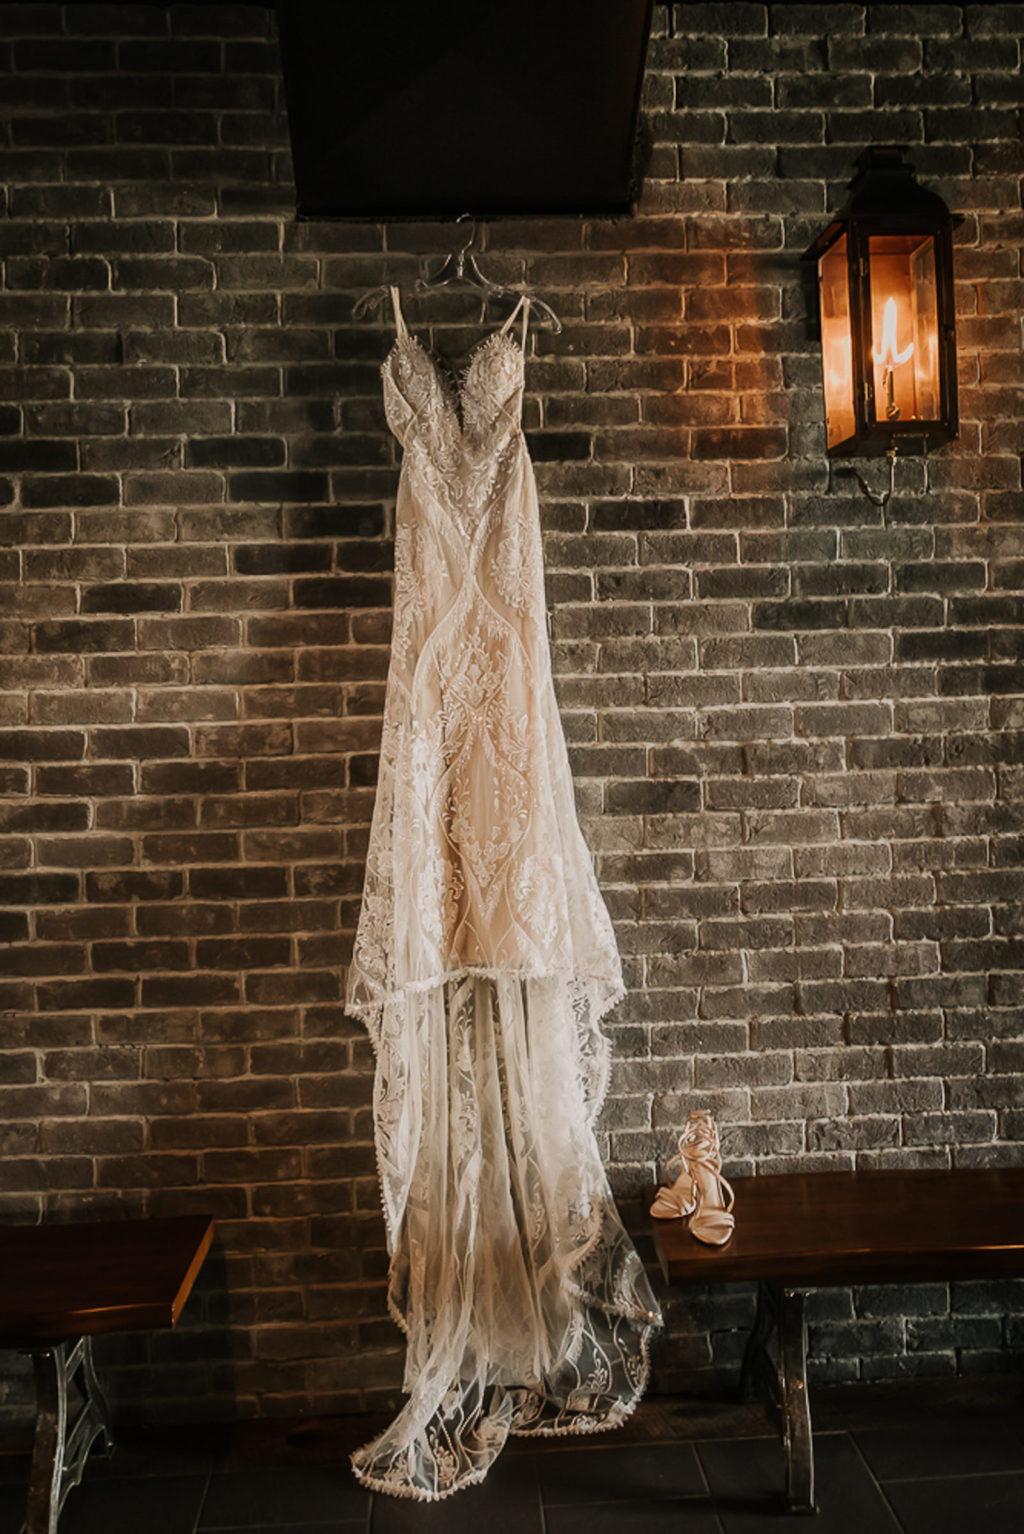 Vintage Inspired Lace Spaghetti Strap Wedding Dress | Off White Fitted Detail Plunge Neckline | Chic Nostalgia